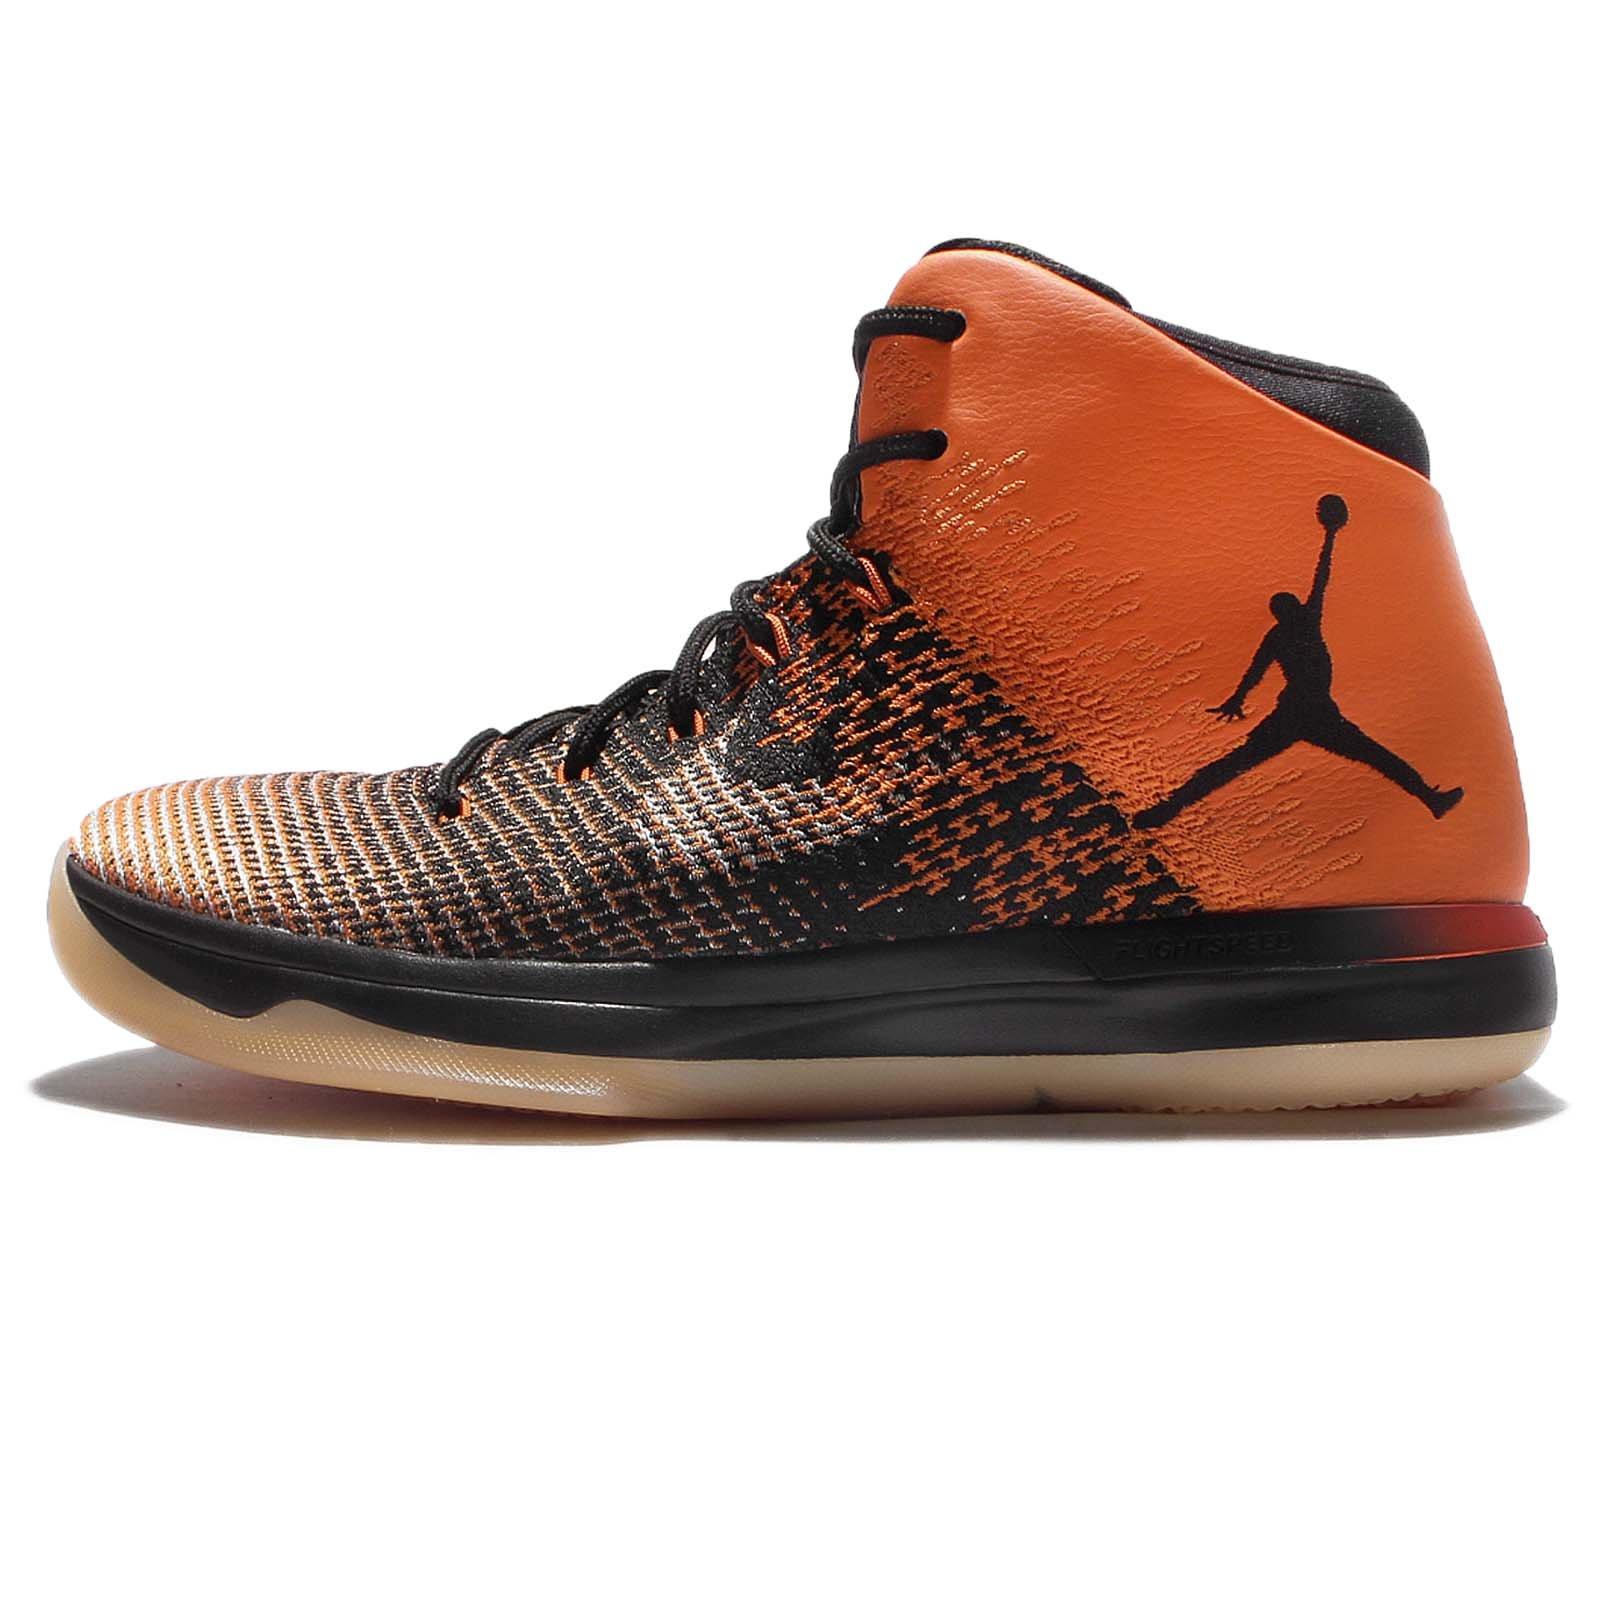 Nike Jordan Men's Air Jordan XXXI Basketball Shoe (9, Black/Black/Starfish)